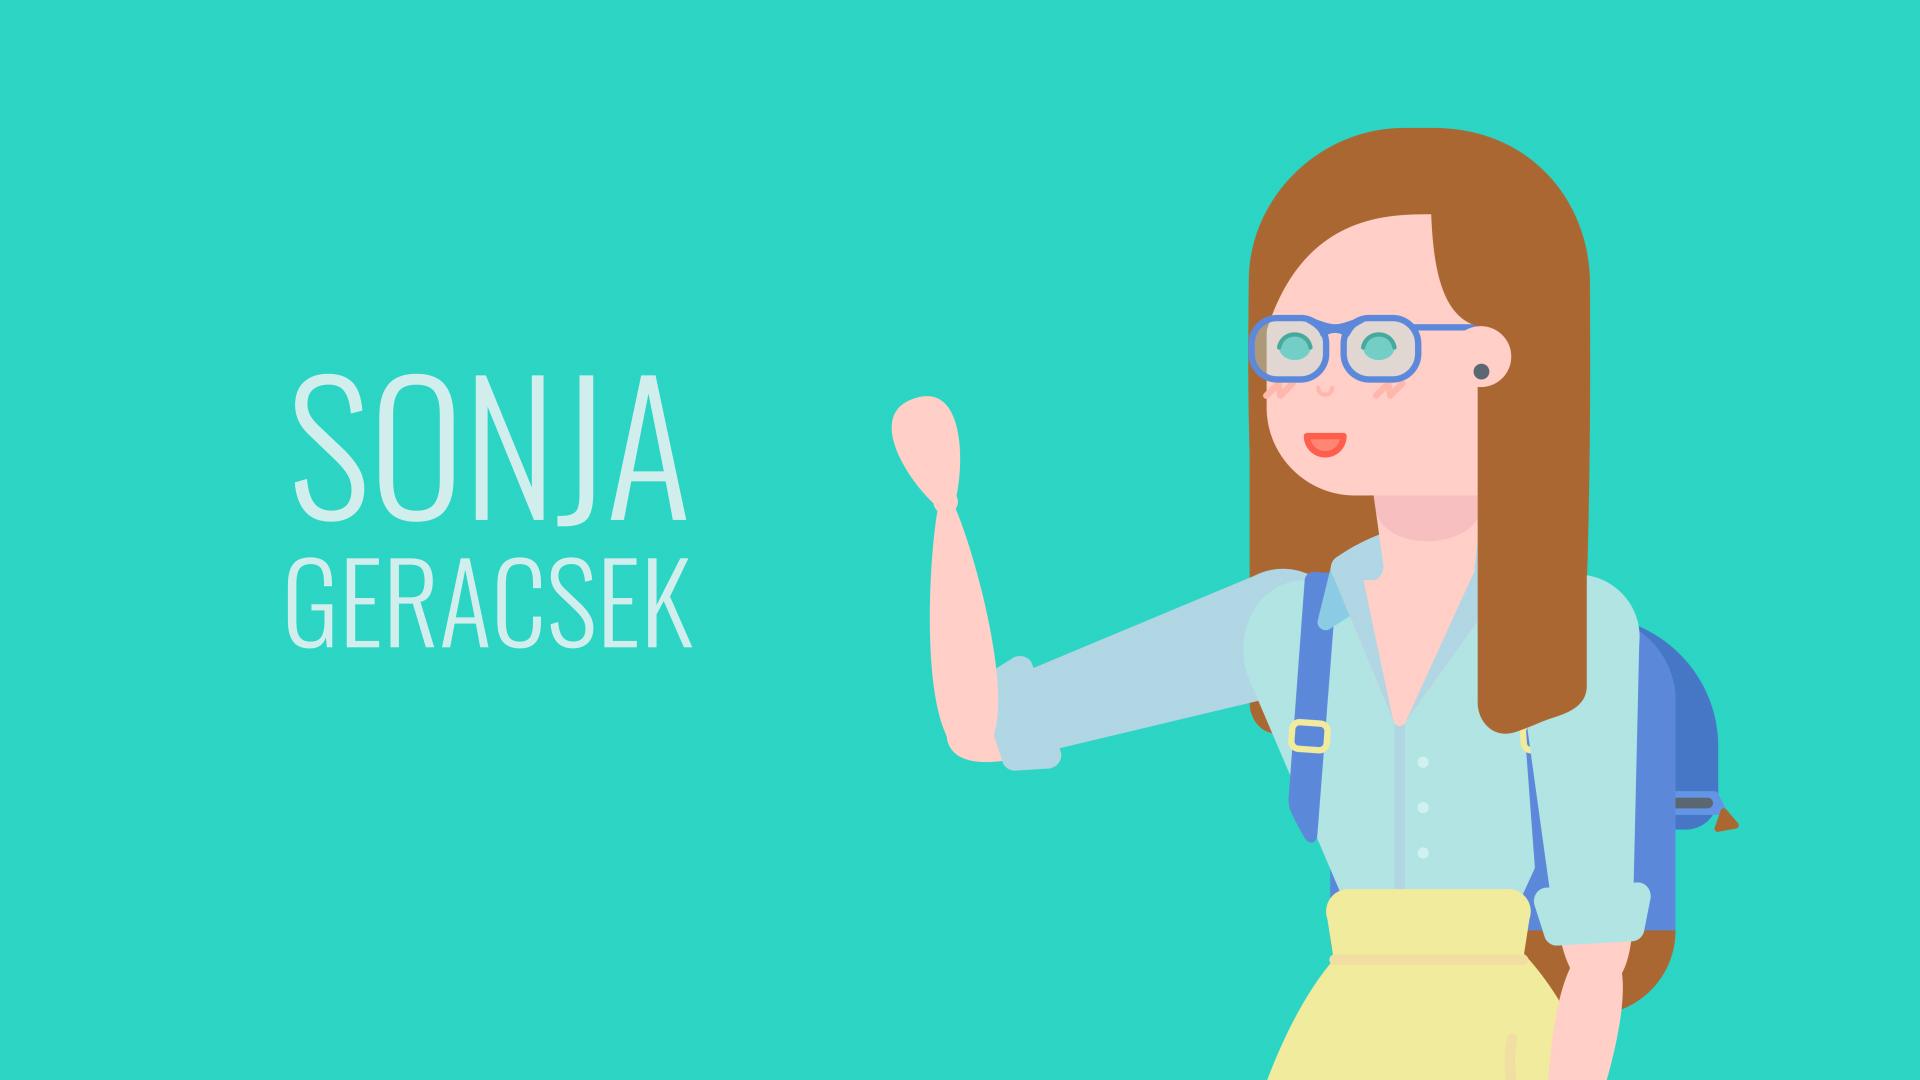 Sonja Character